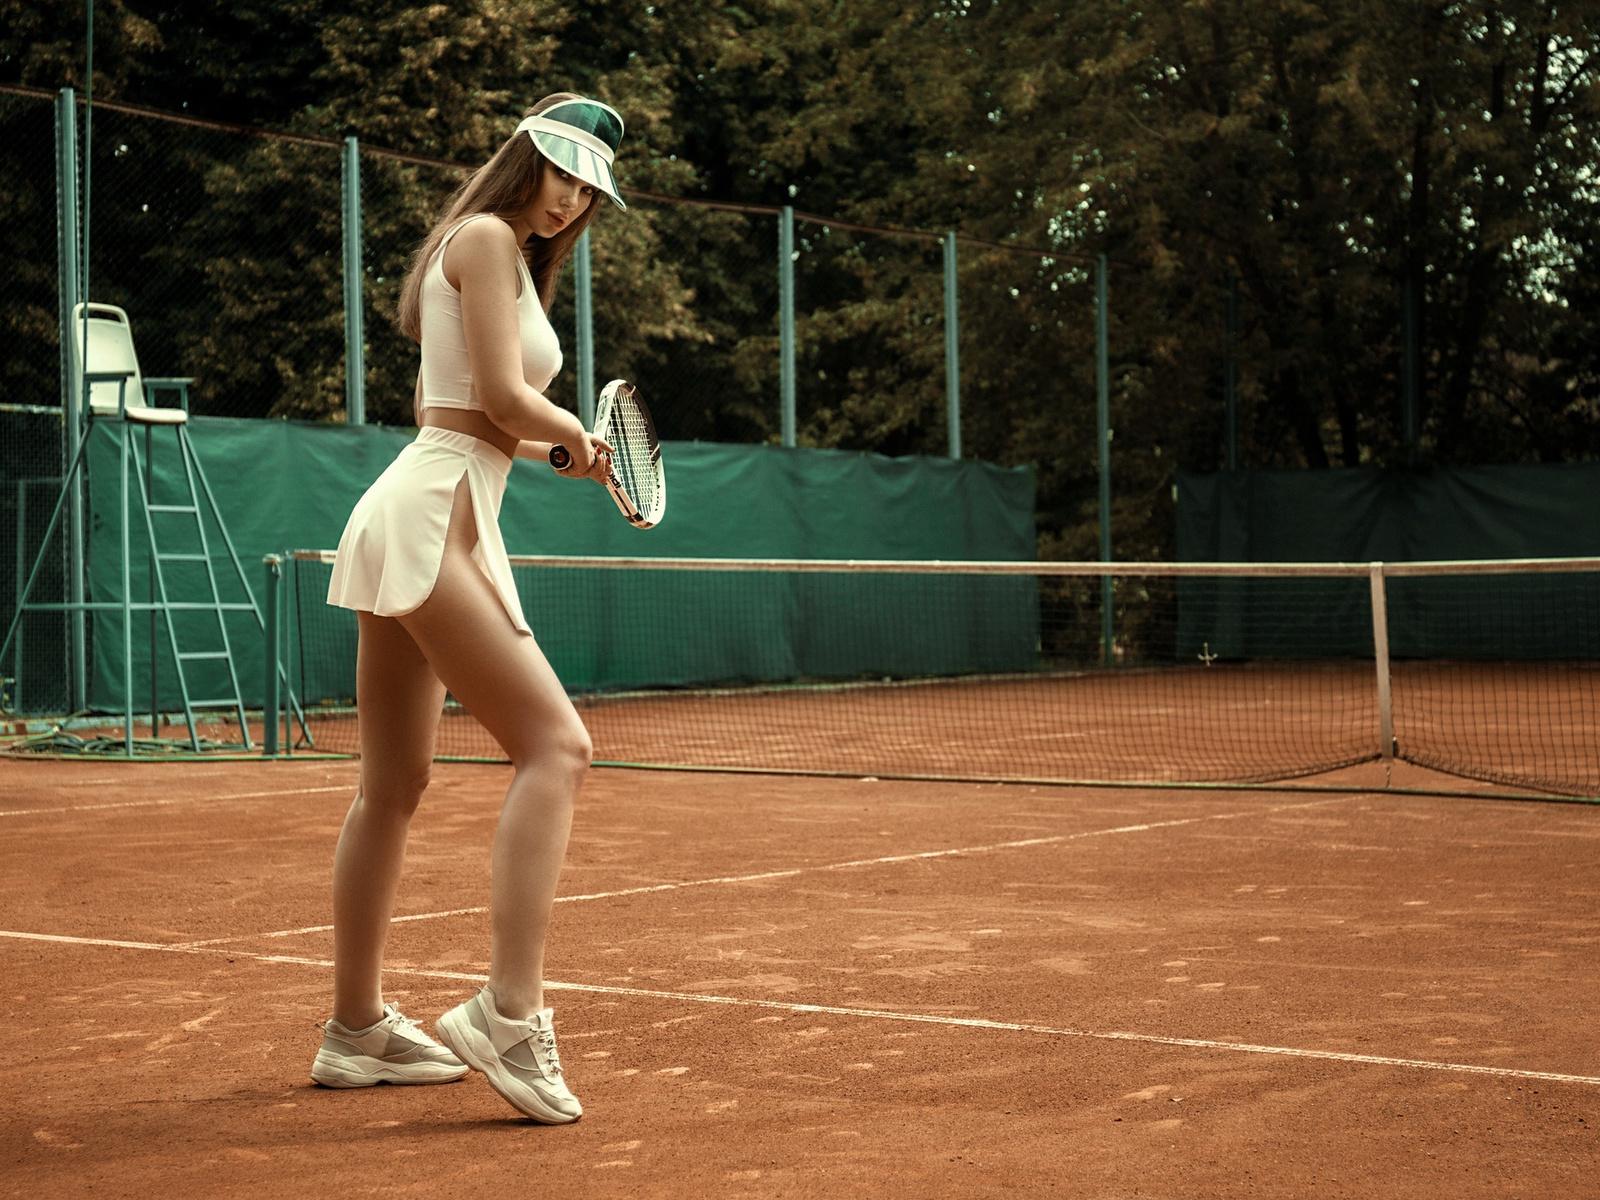 women, skirt, tennis, white clothing, sneakers, women outdoors, tennis rackets, tennis balls, sportswear, brunette